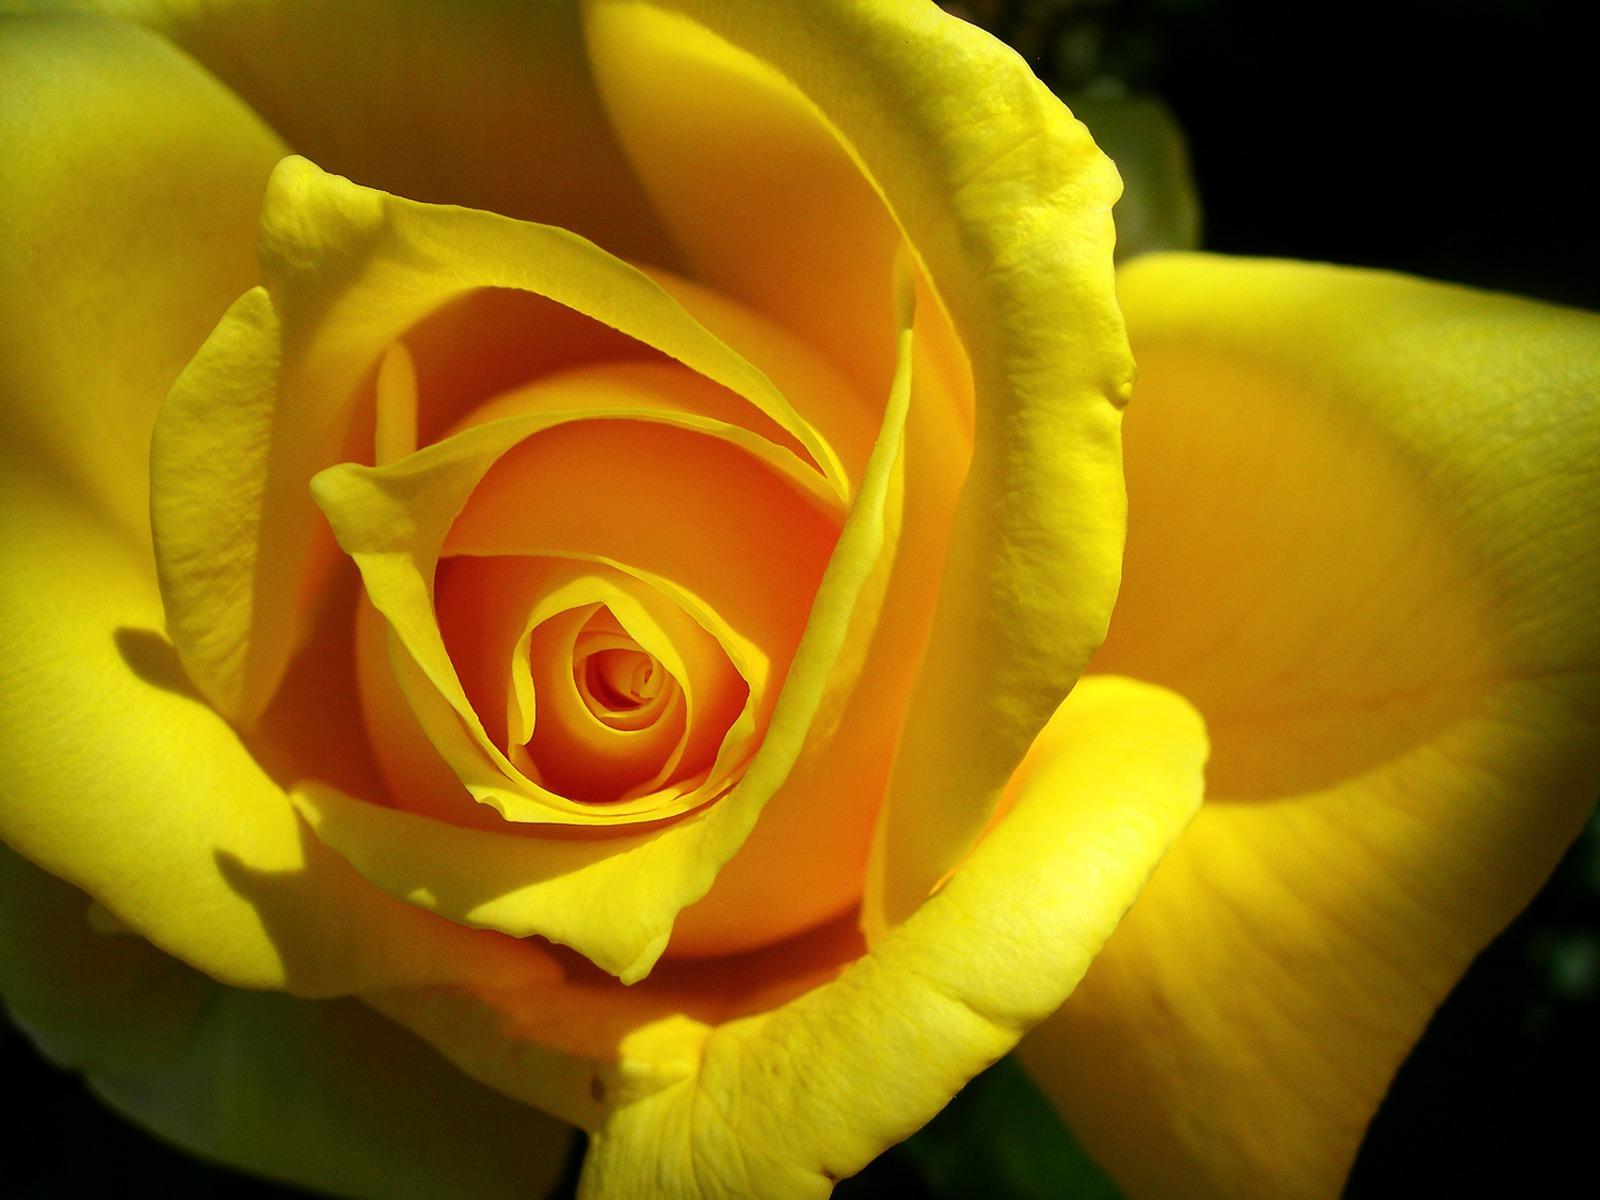 yellow rose flower wallpaper - photo #31